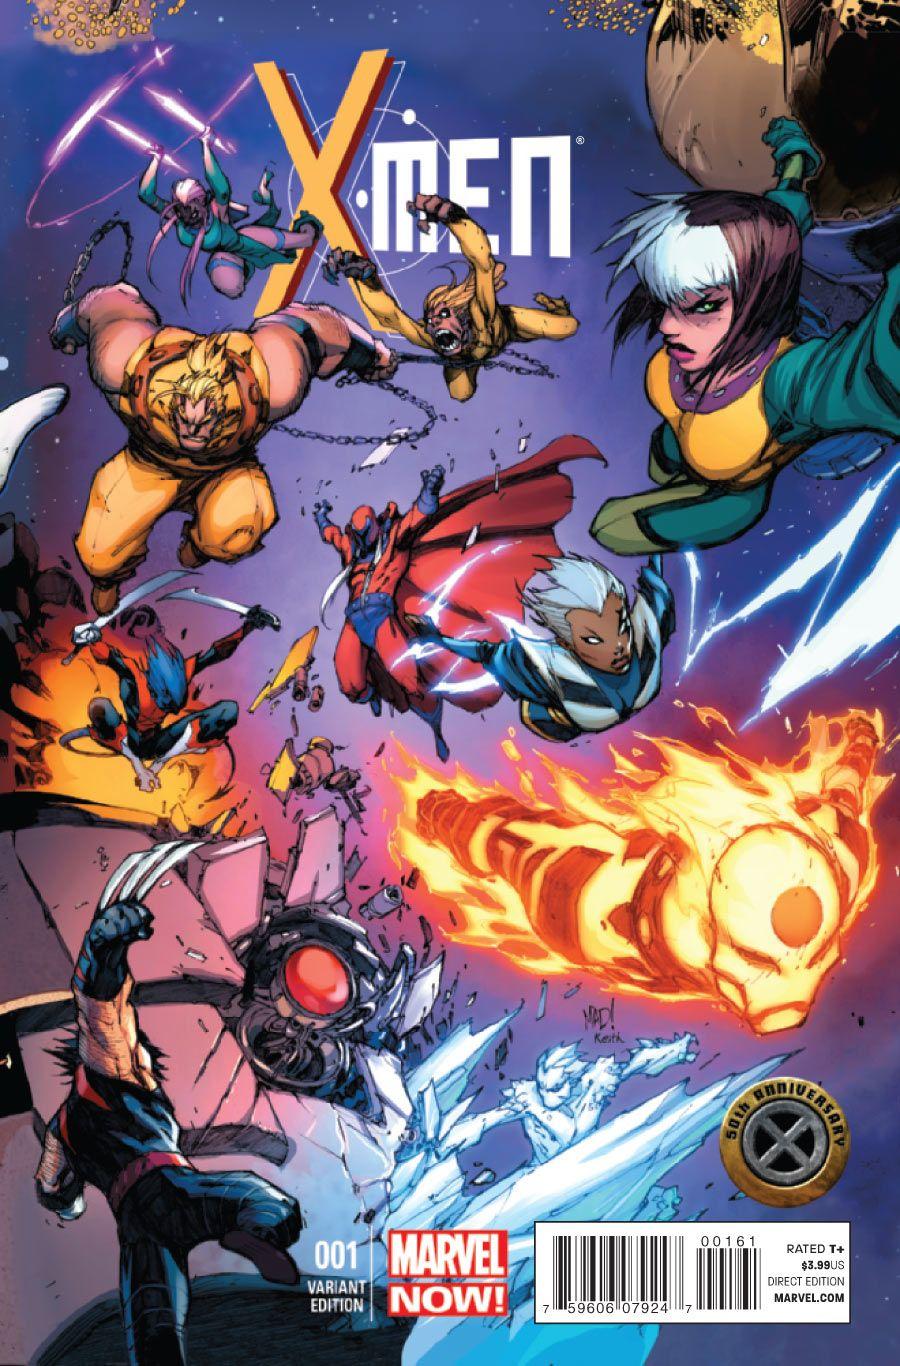 X Men Vol 2 1 Variant Cover By Joe Madureira Joe Madureira Marvel Comics Art Comics